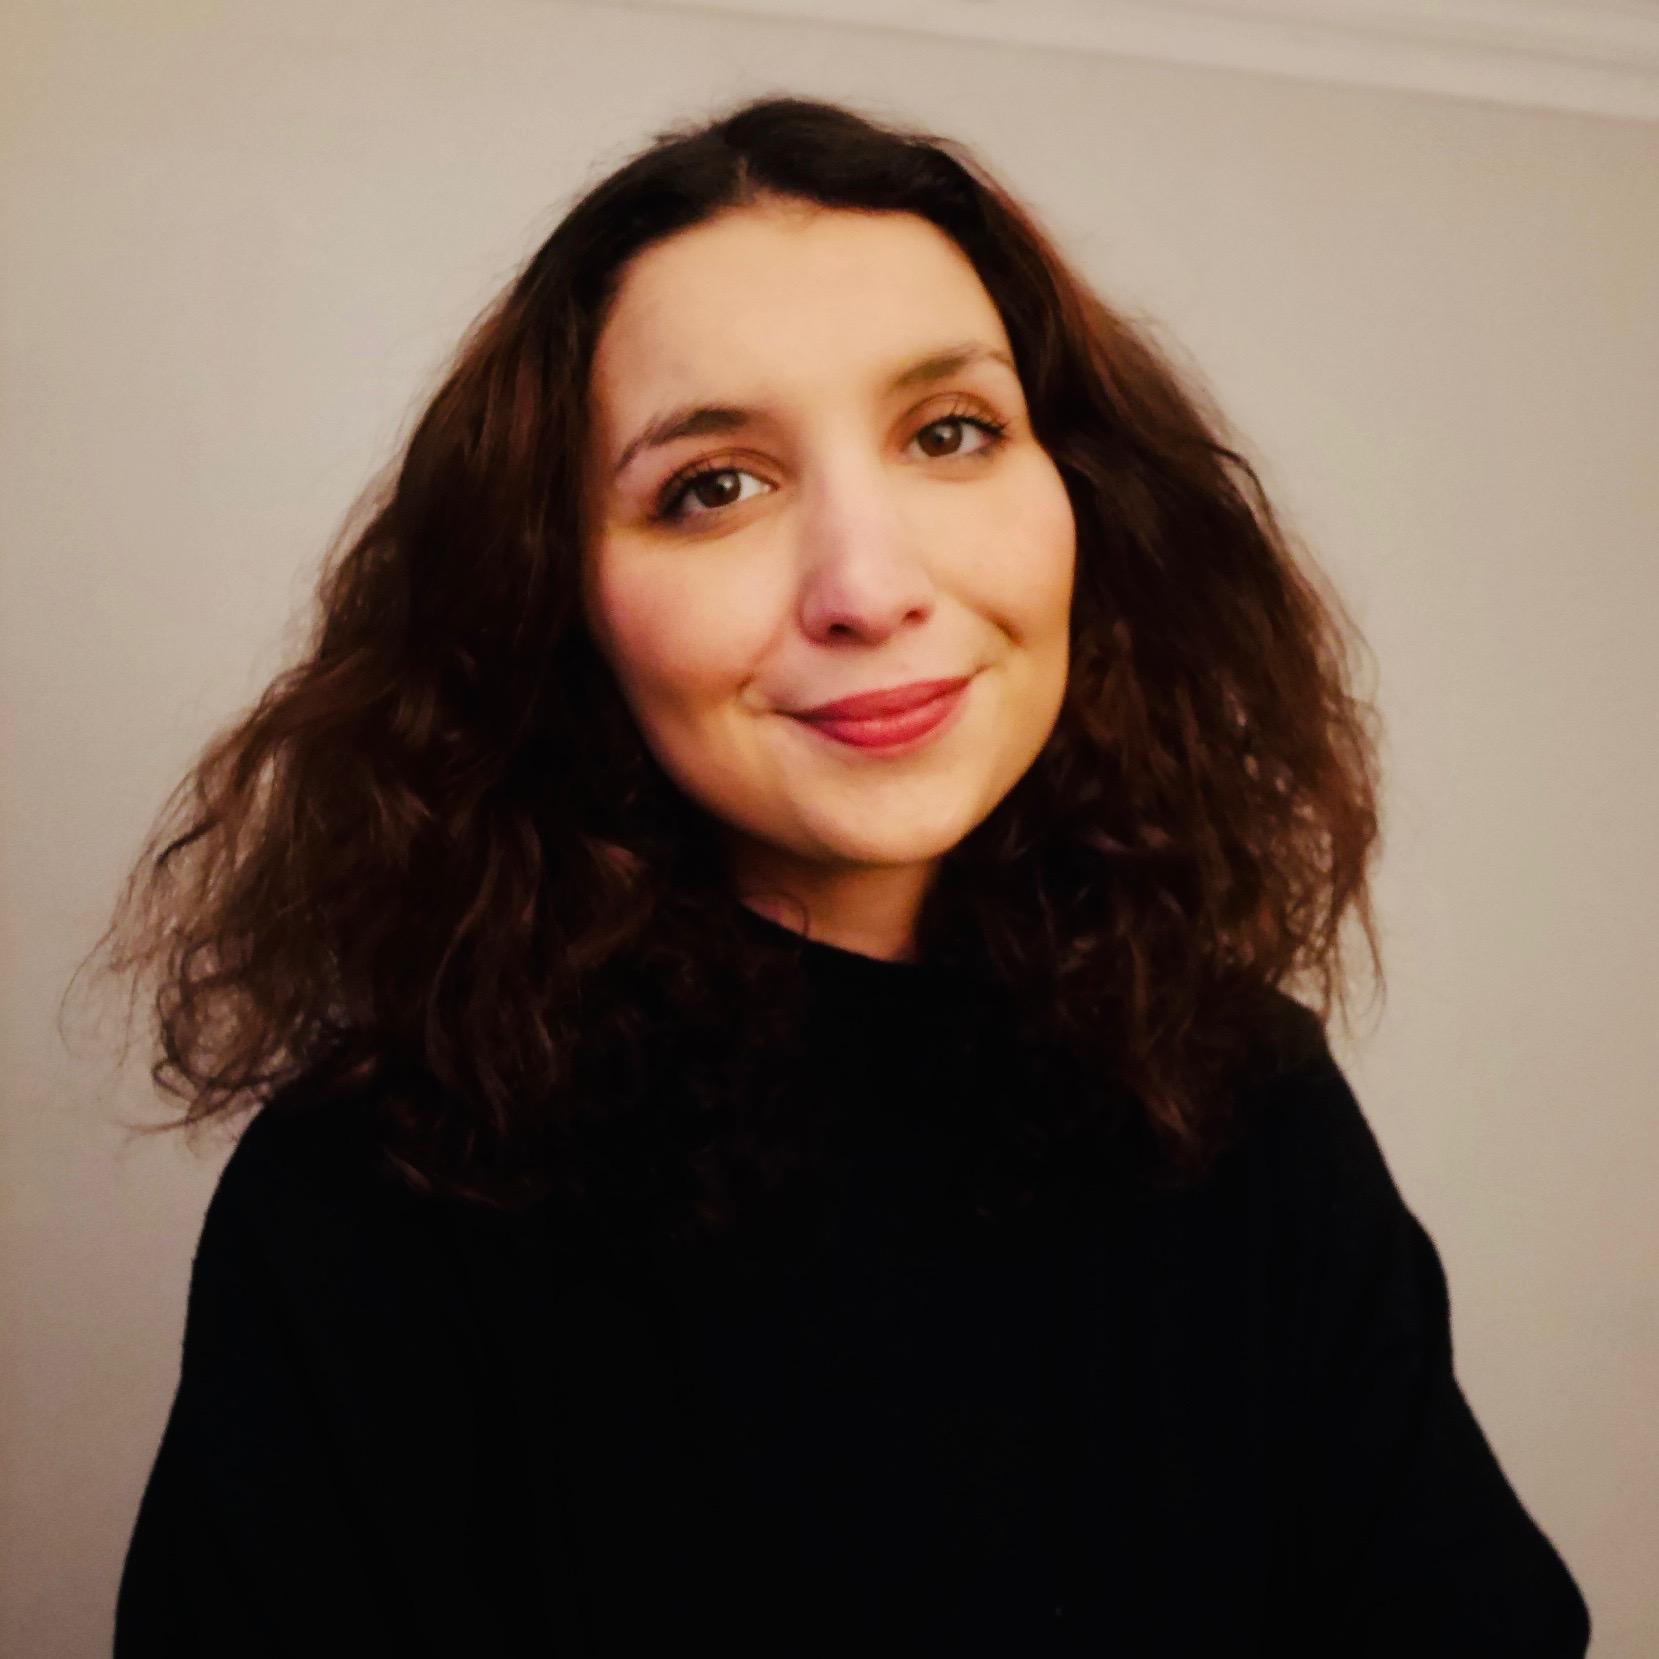 Lina Fourneau